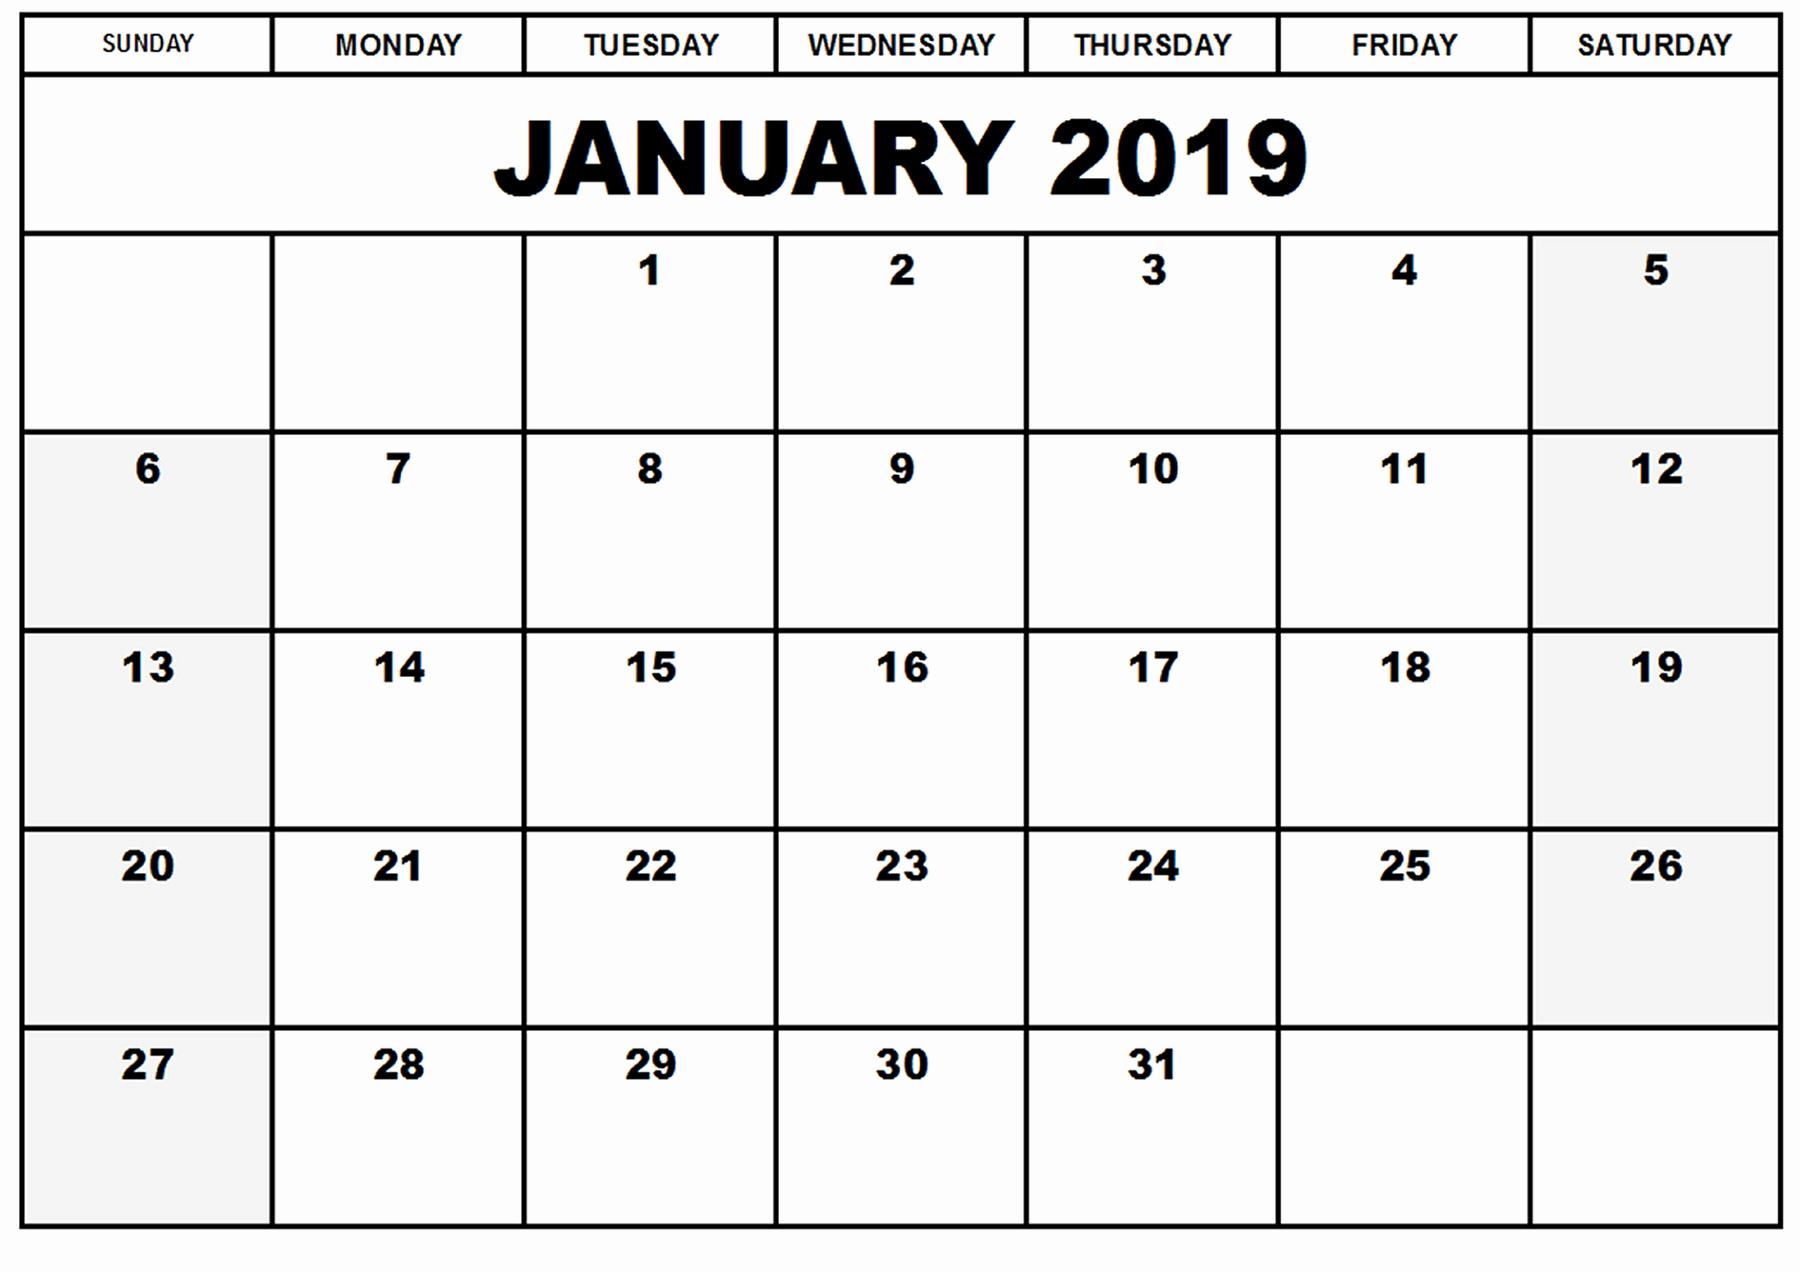 2019 Monthly Calendar Template Inspirational Blank Printable Calendar 2019 Monthly – Printable Shelter